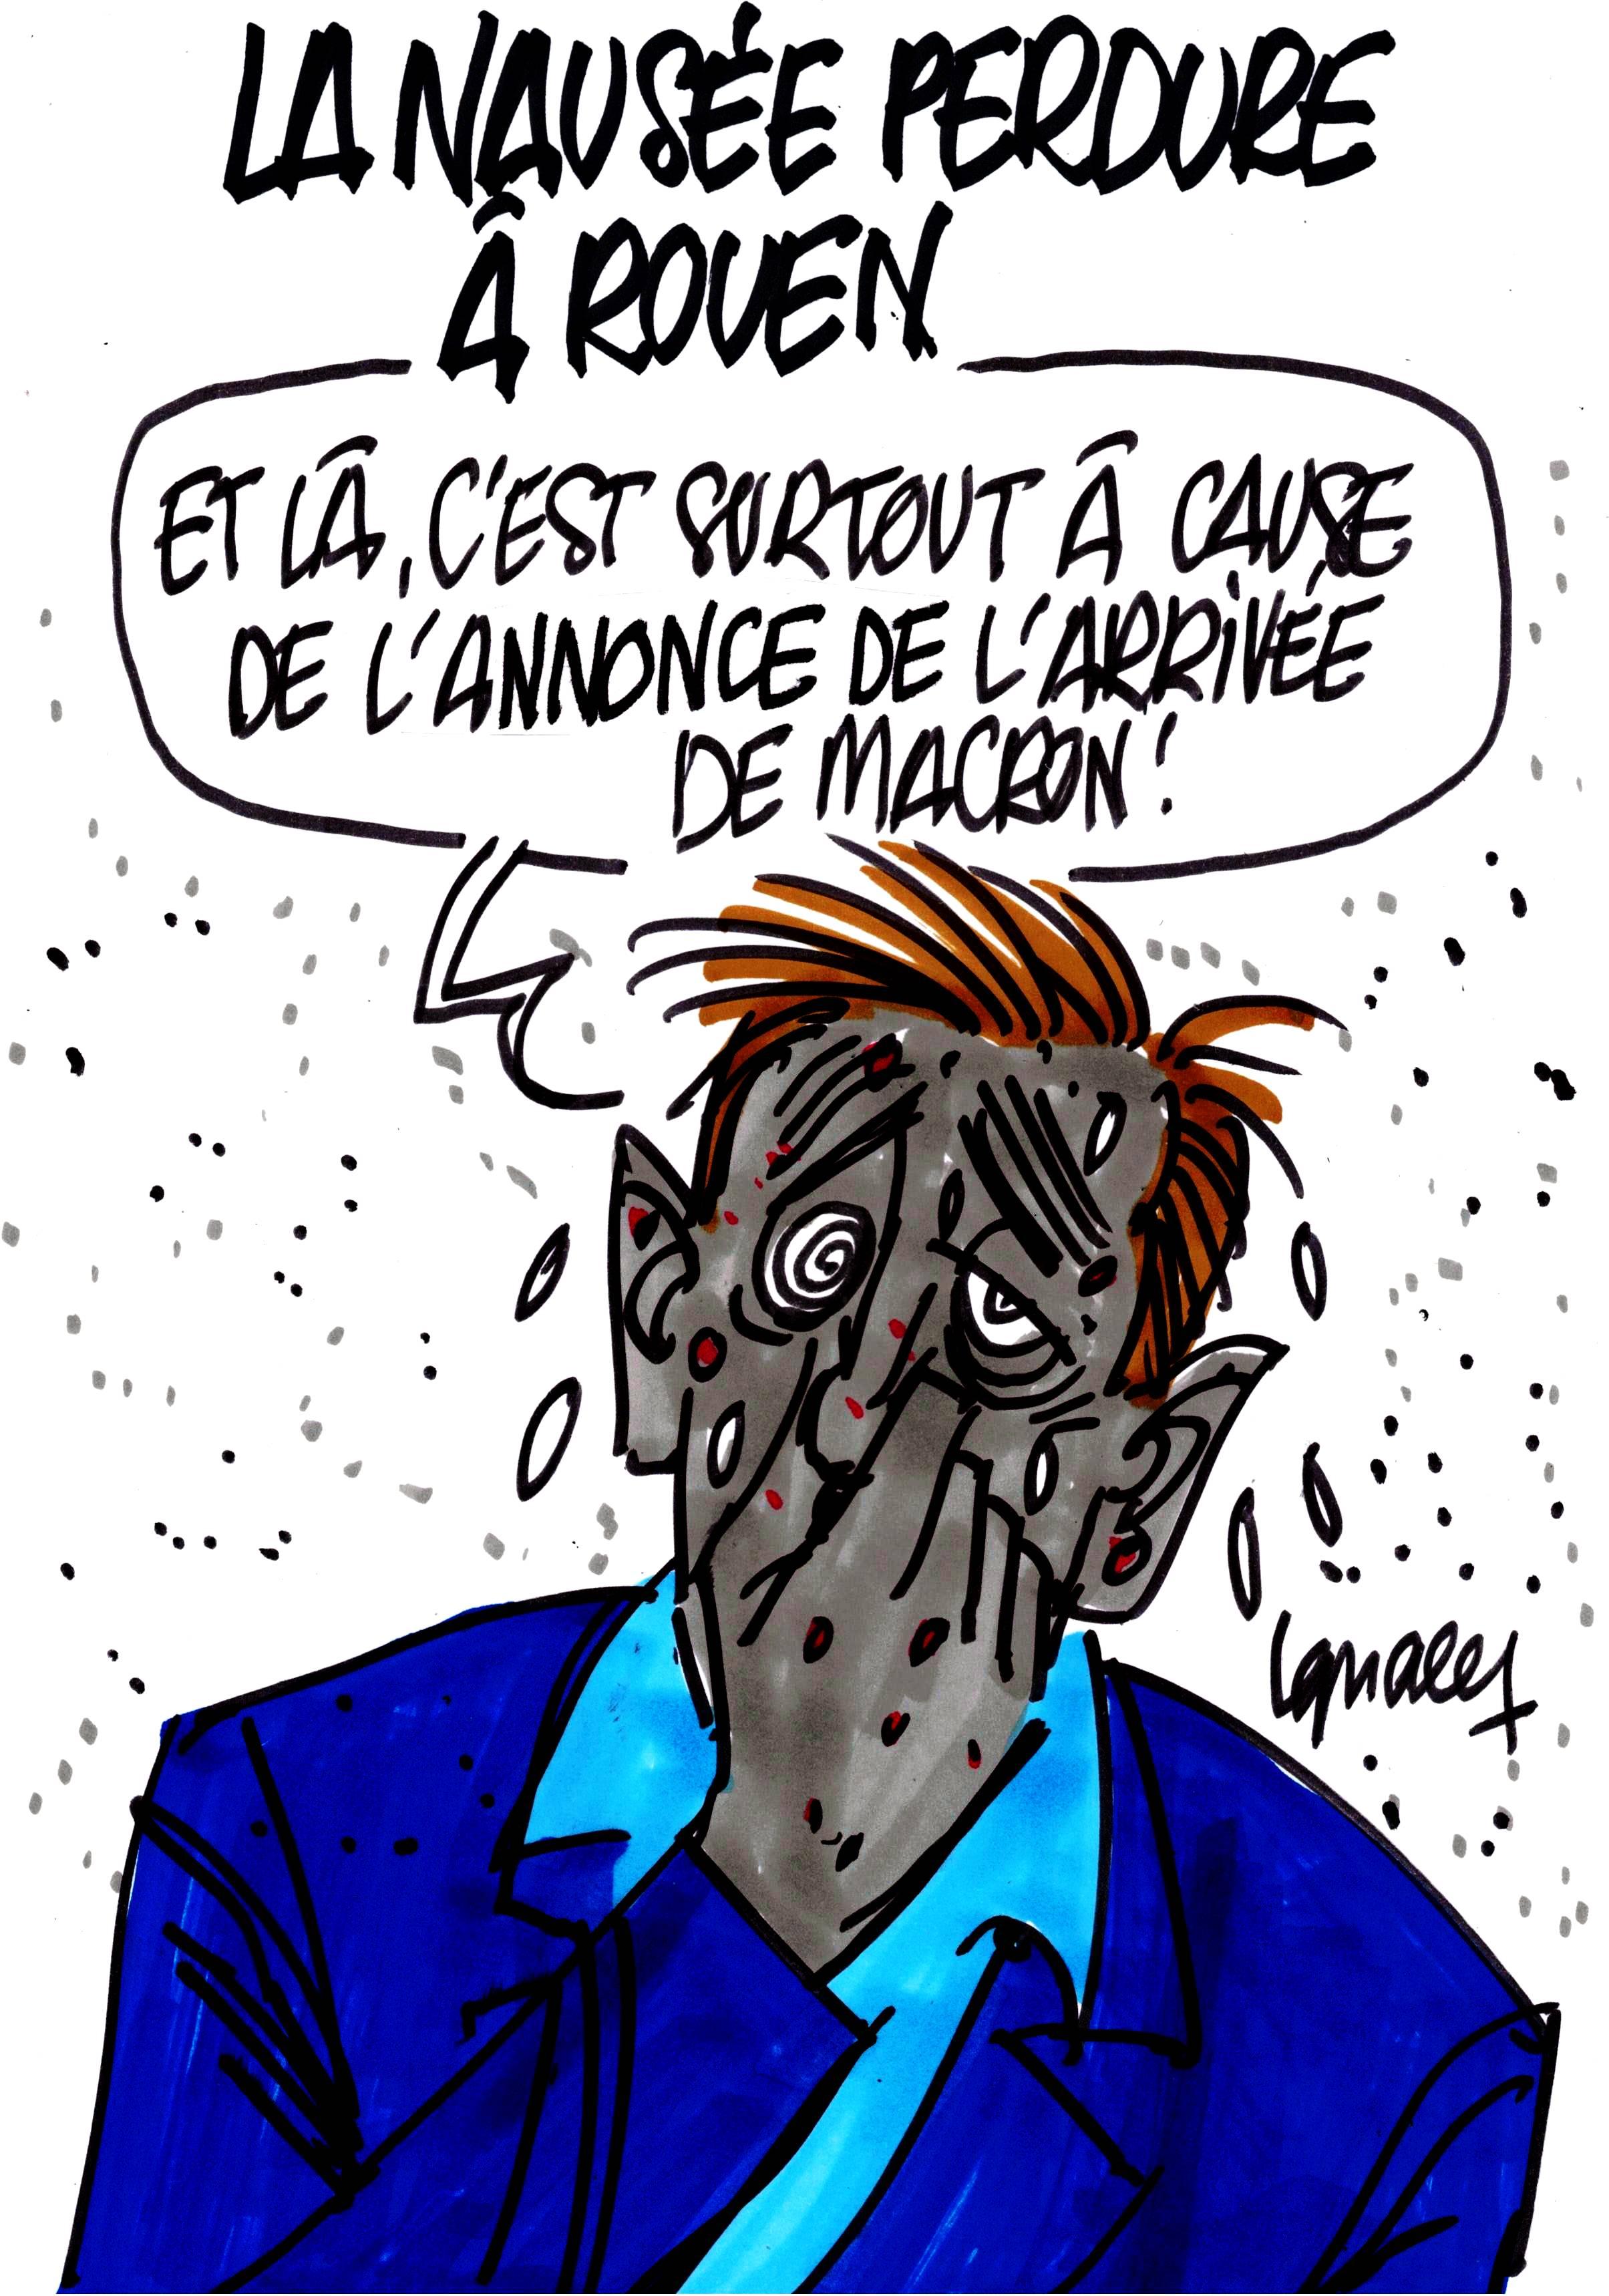 Ignace - La nausée perdure à Rouen